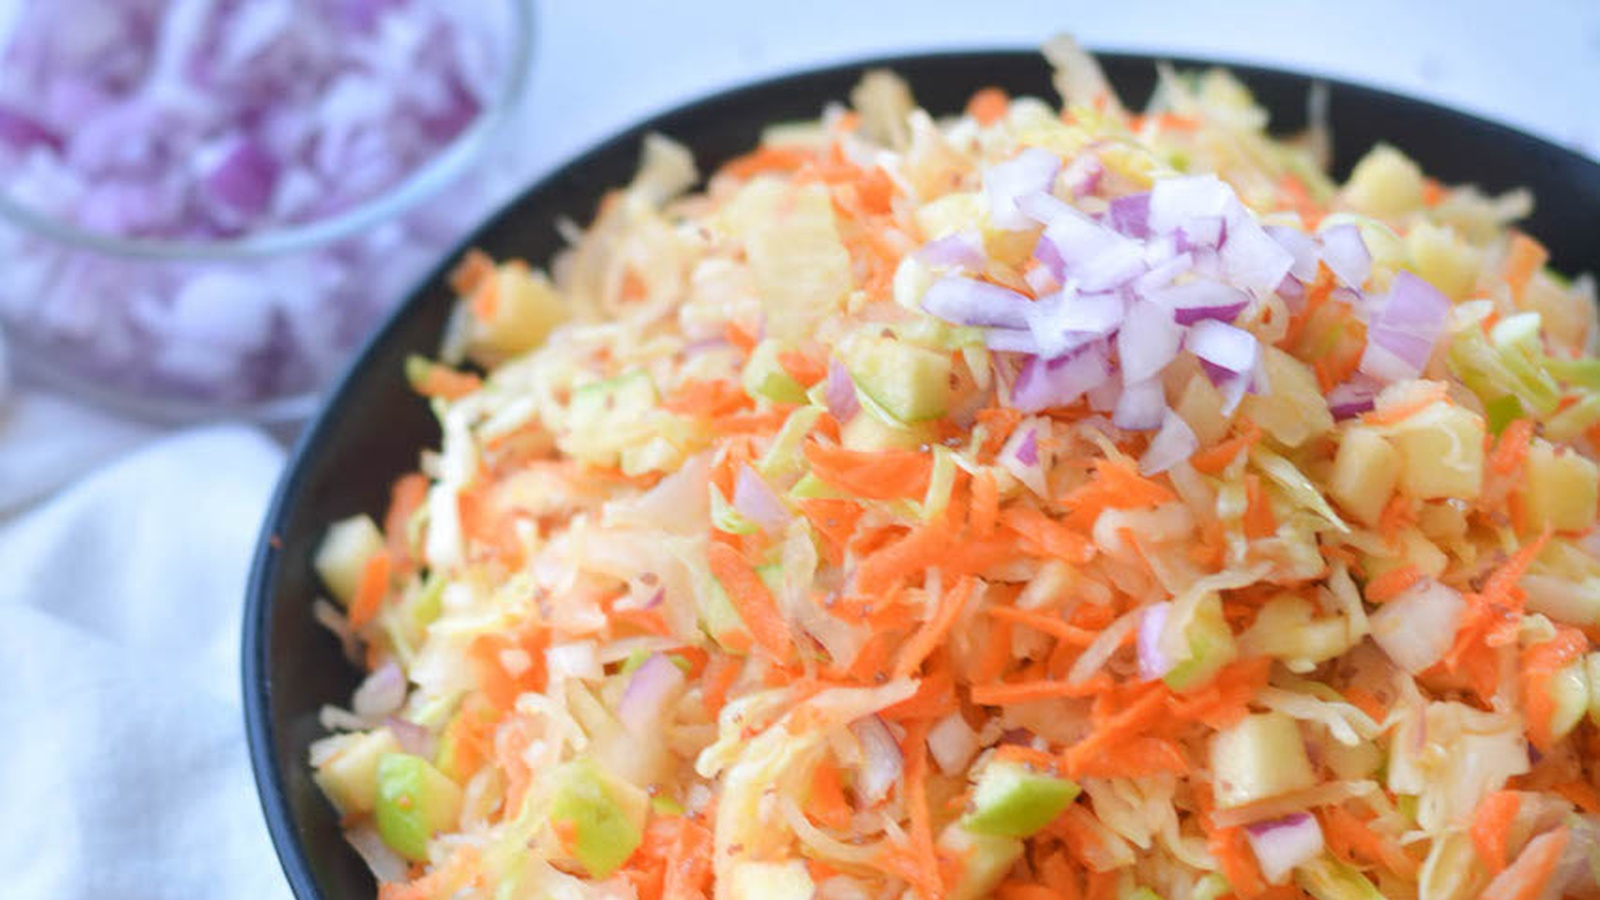 The Best Sauerkraut Salad Food Matters